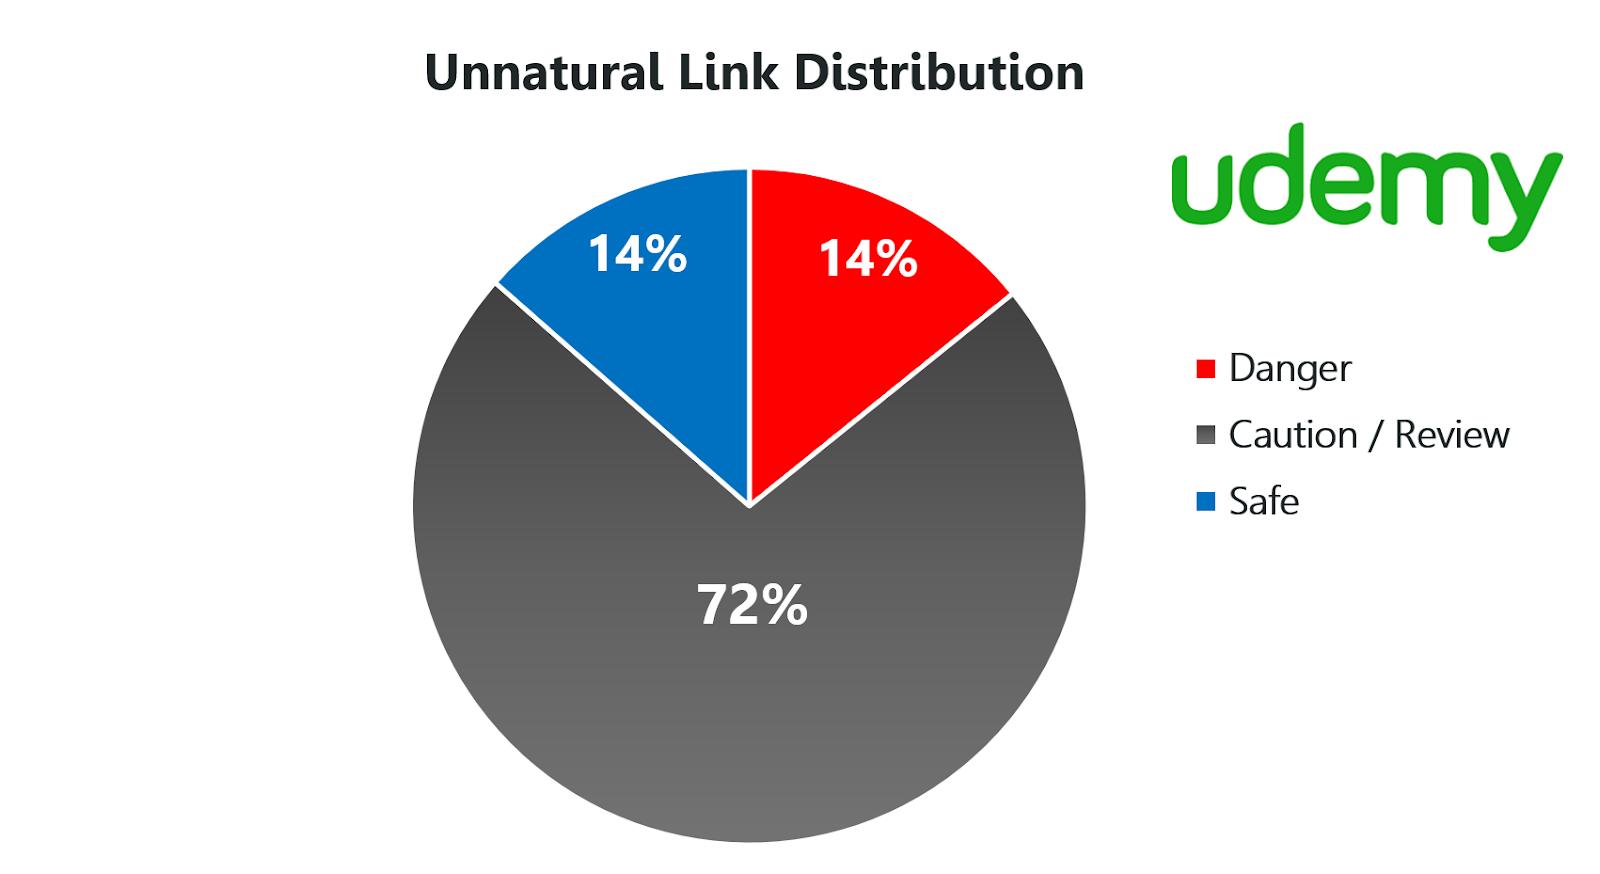 unnatural link distribution